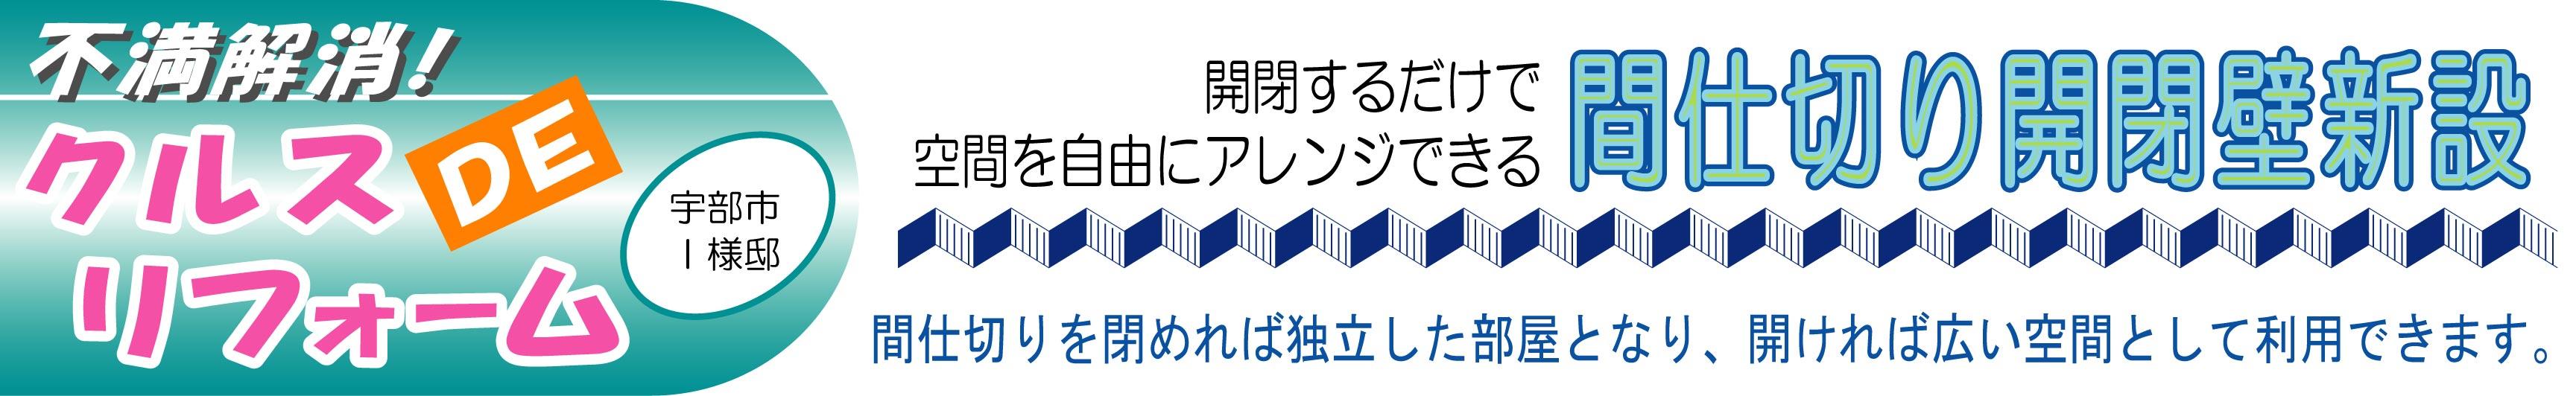 KuraSi-natu-sin79-08.jpg